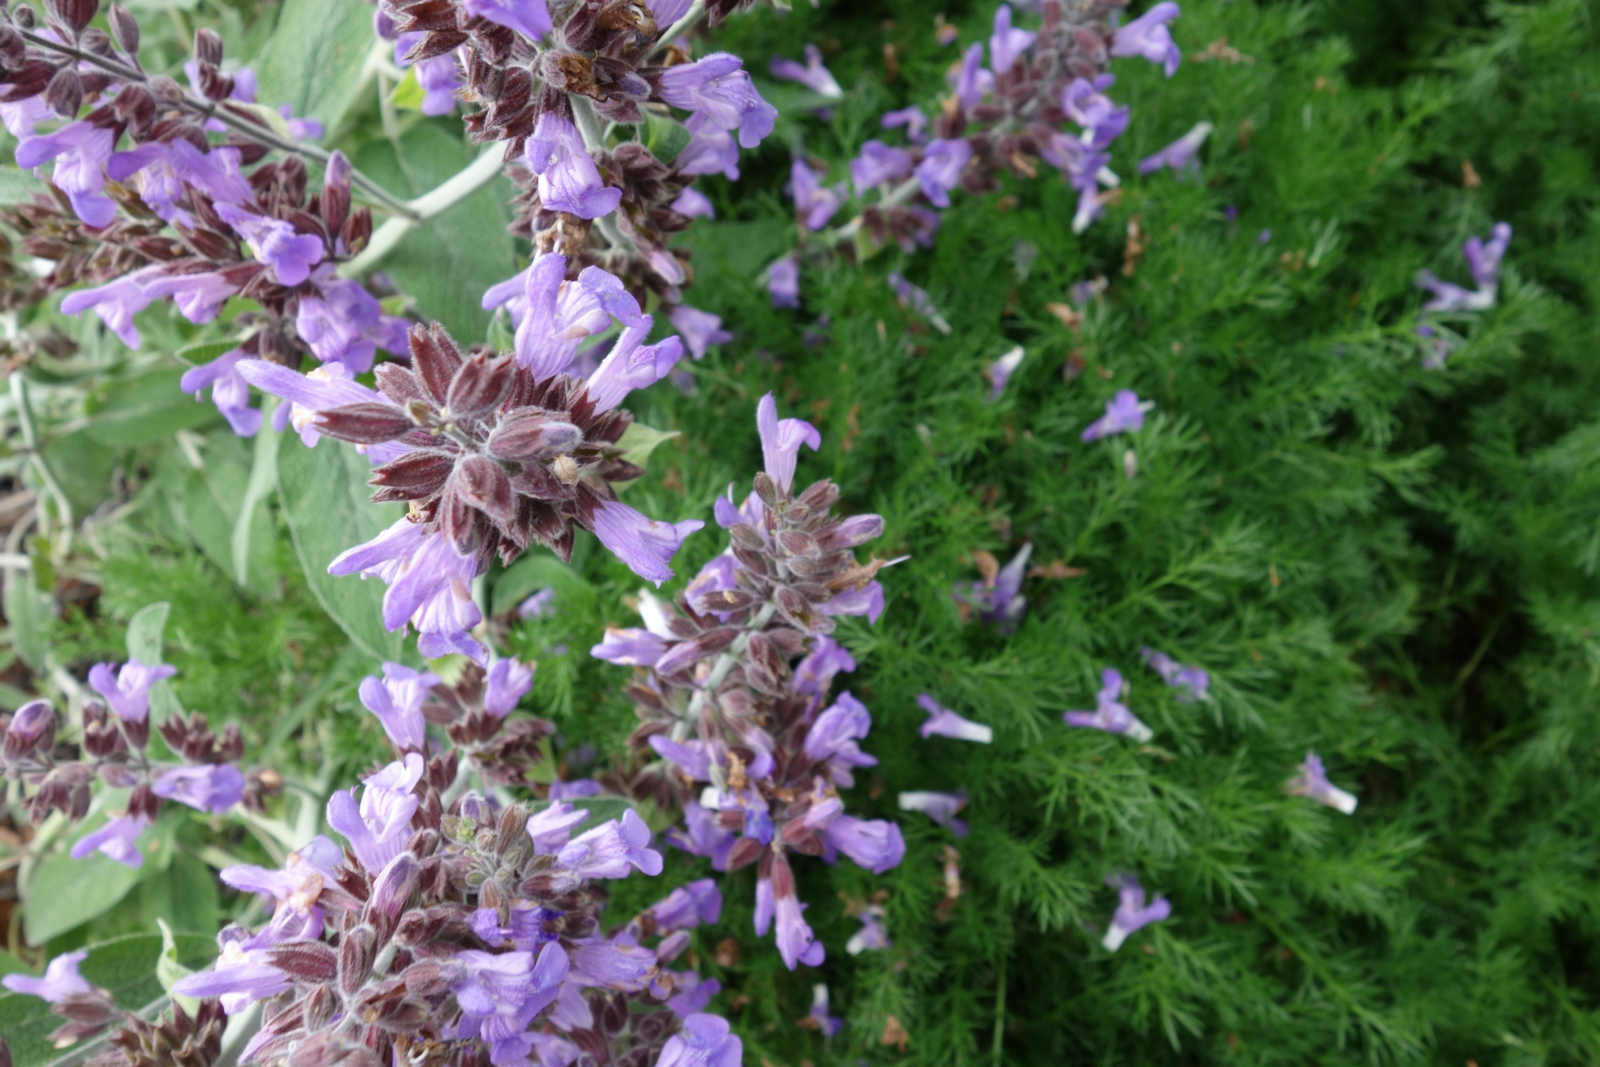 true spring flowers in the edible garden